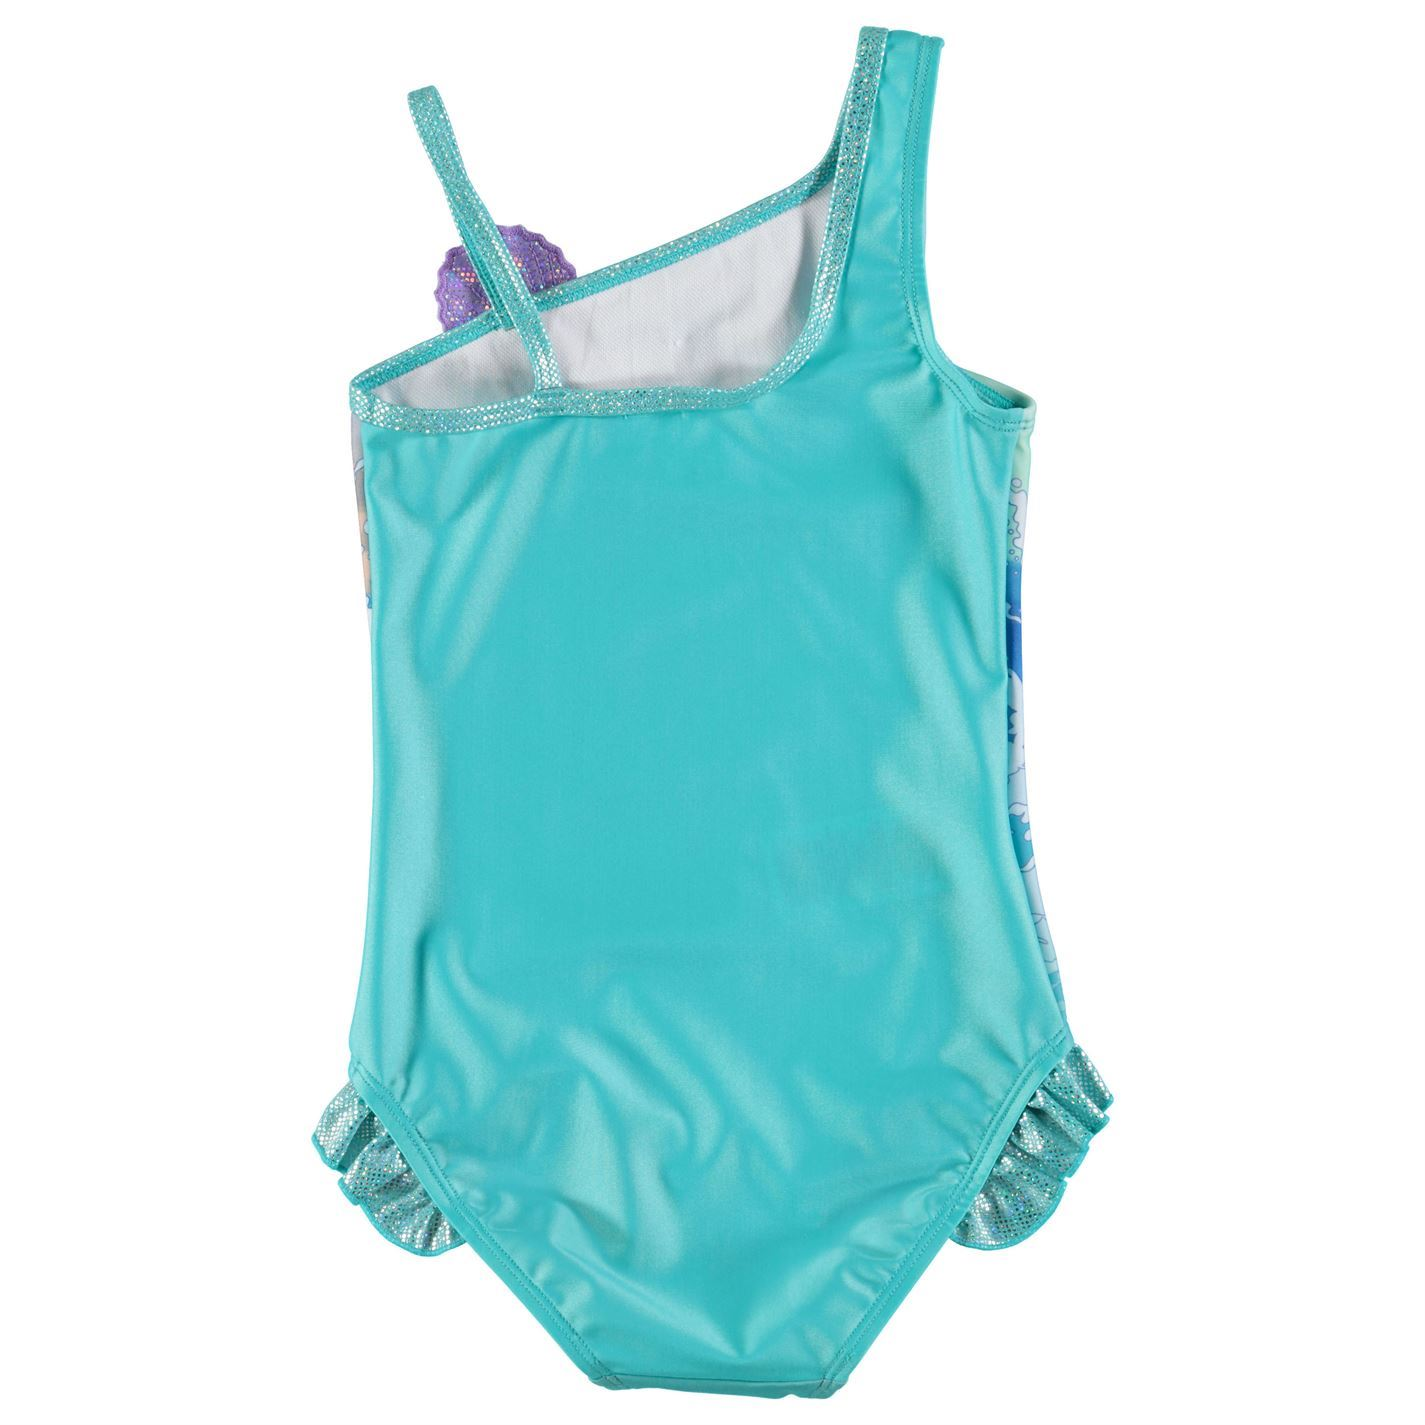 c2600d64d4 ... The Little Mermaid Ariel Swimsuit Infant Girls Aqua Swimming Costume  Beachwear ...